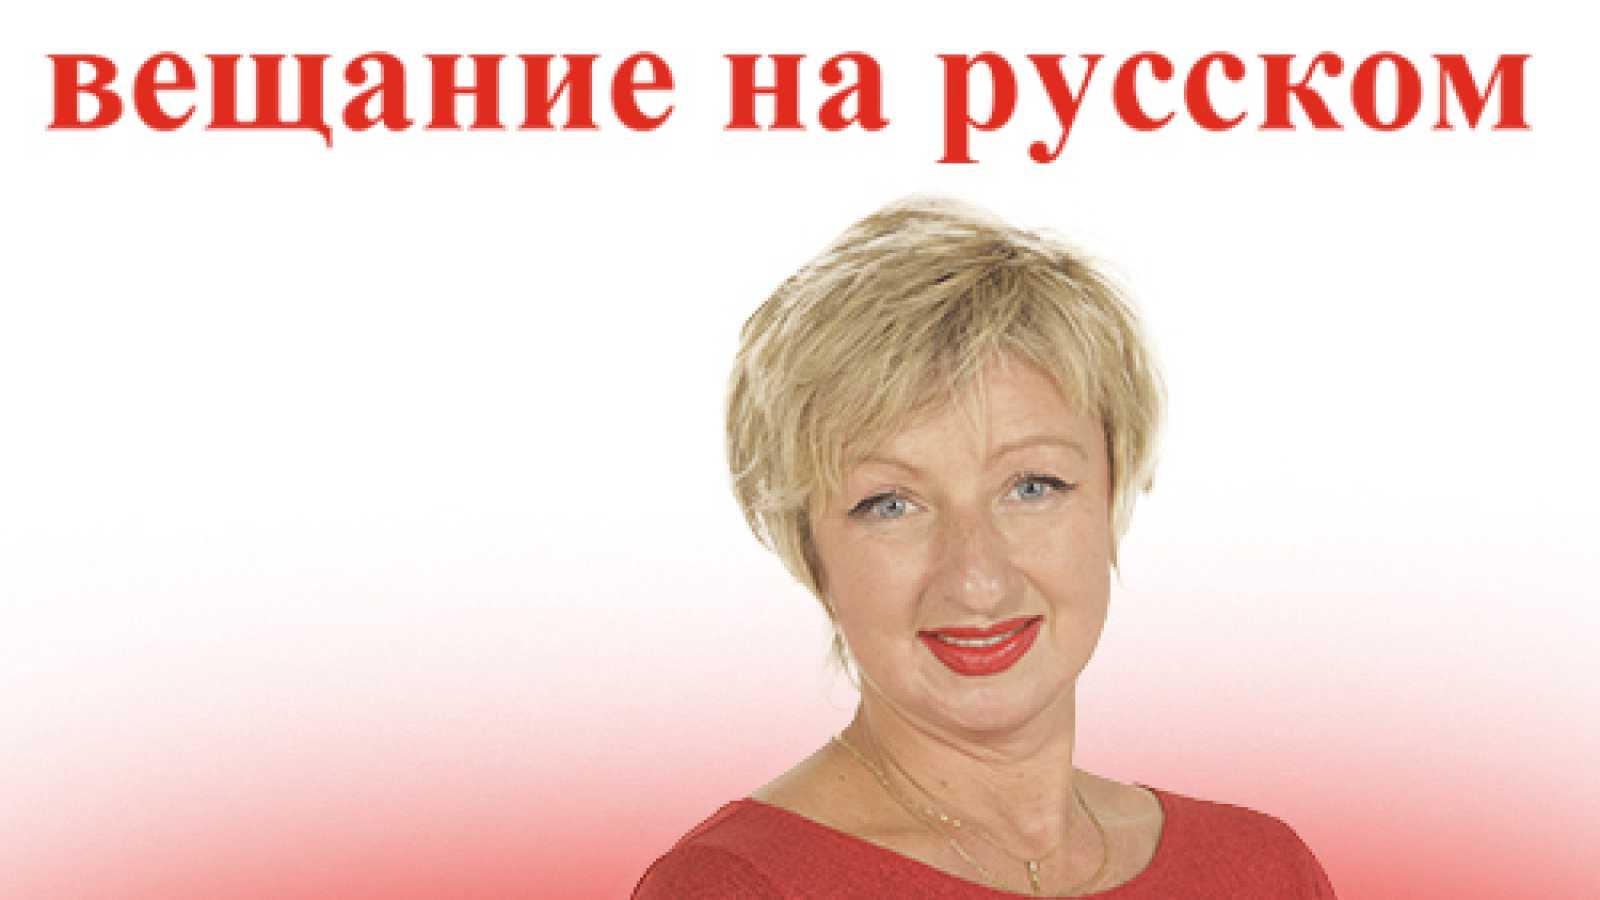 Emisión en ruso - Kultprosvet. Noviy god blizko- blizko - 14/12/20 - Escuchar ahora